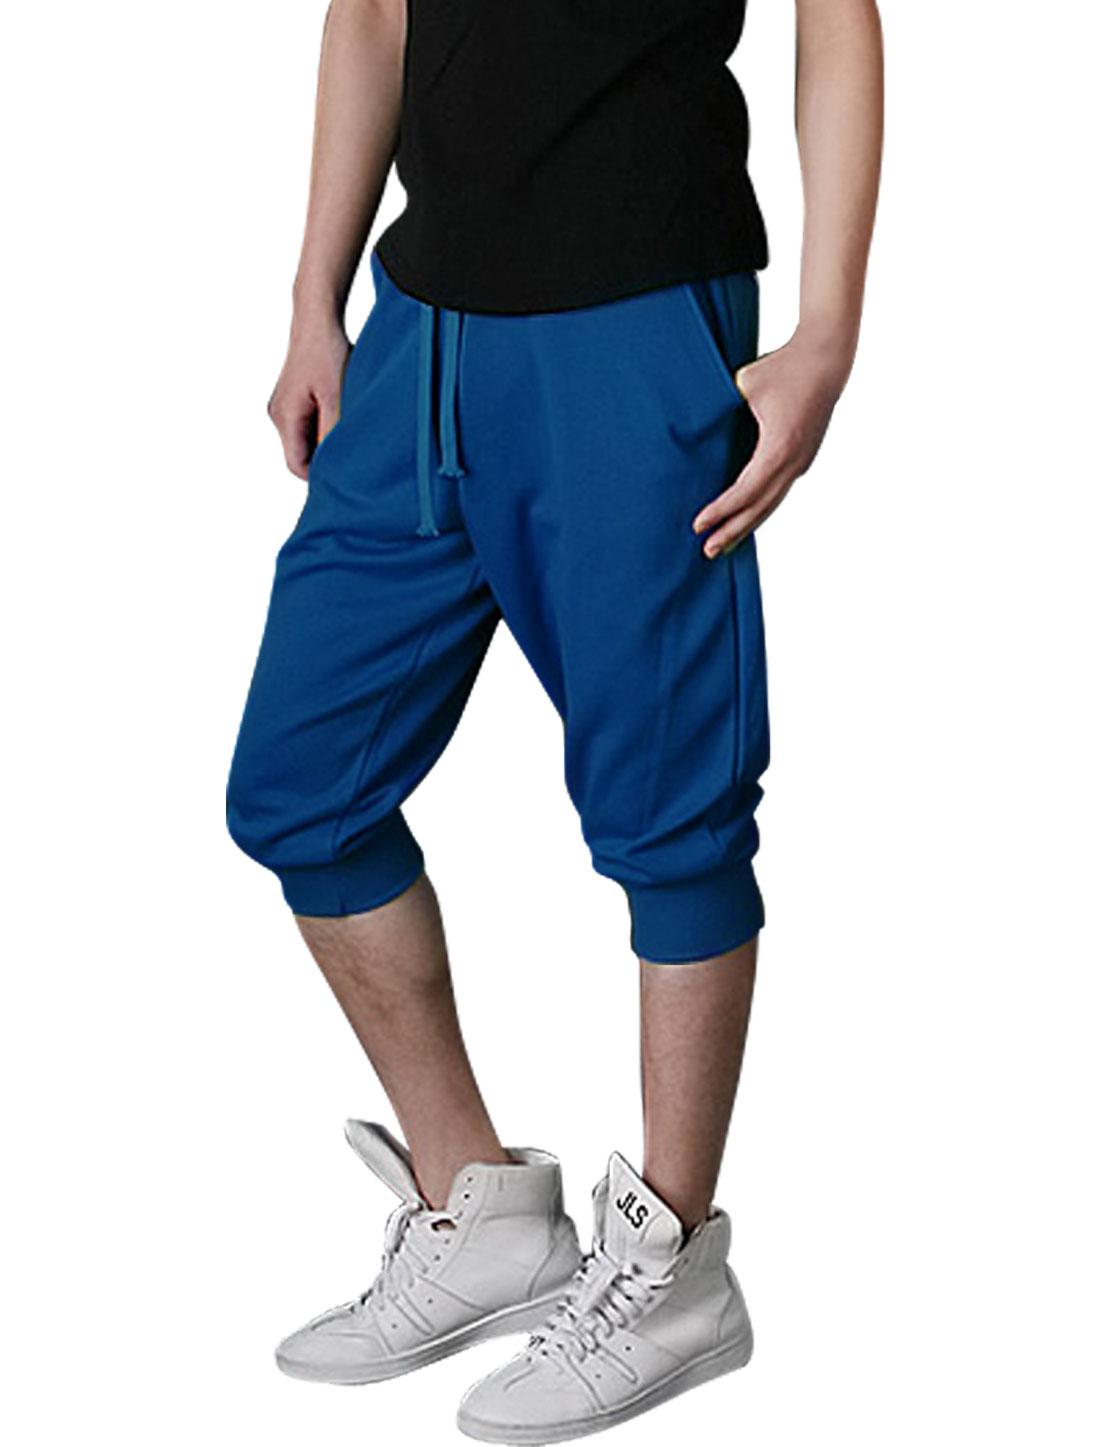 Men Drawstring Elastic Waist Stretchy Capris Pants Royal Blue W29